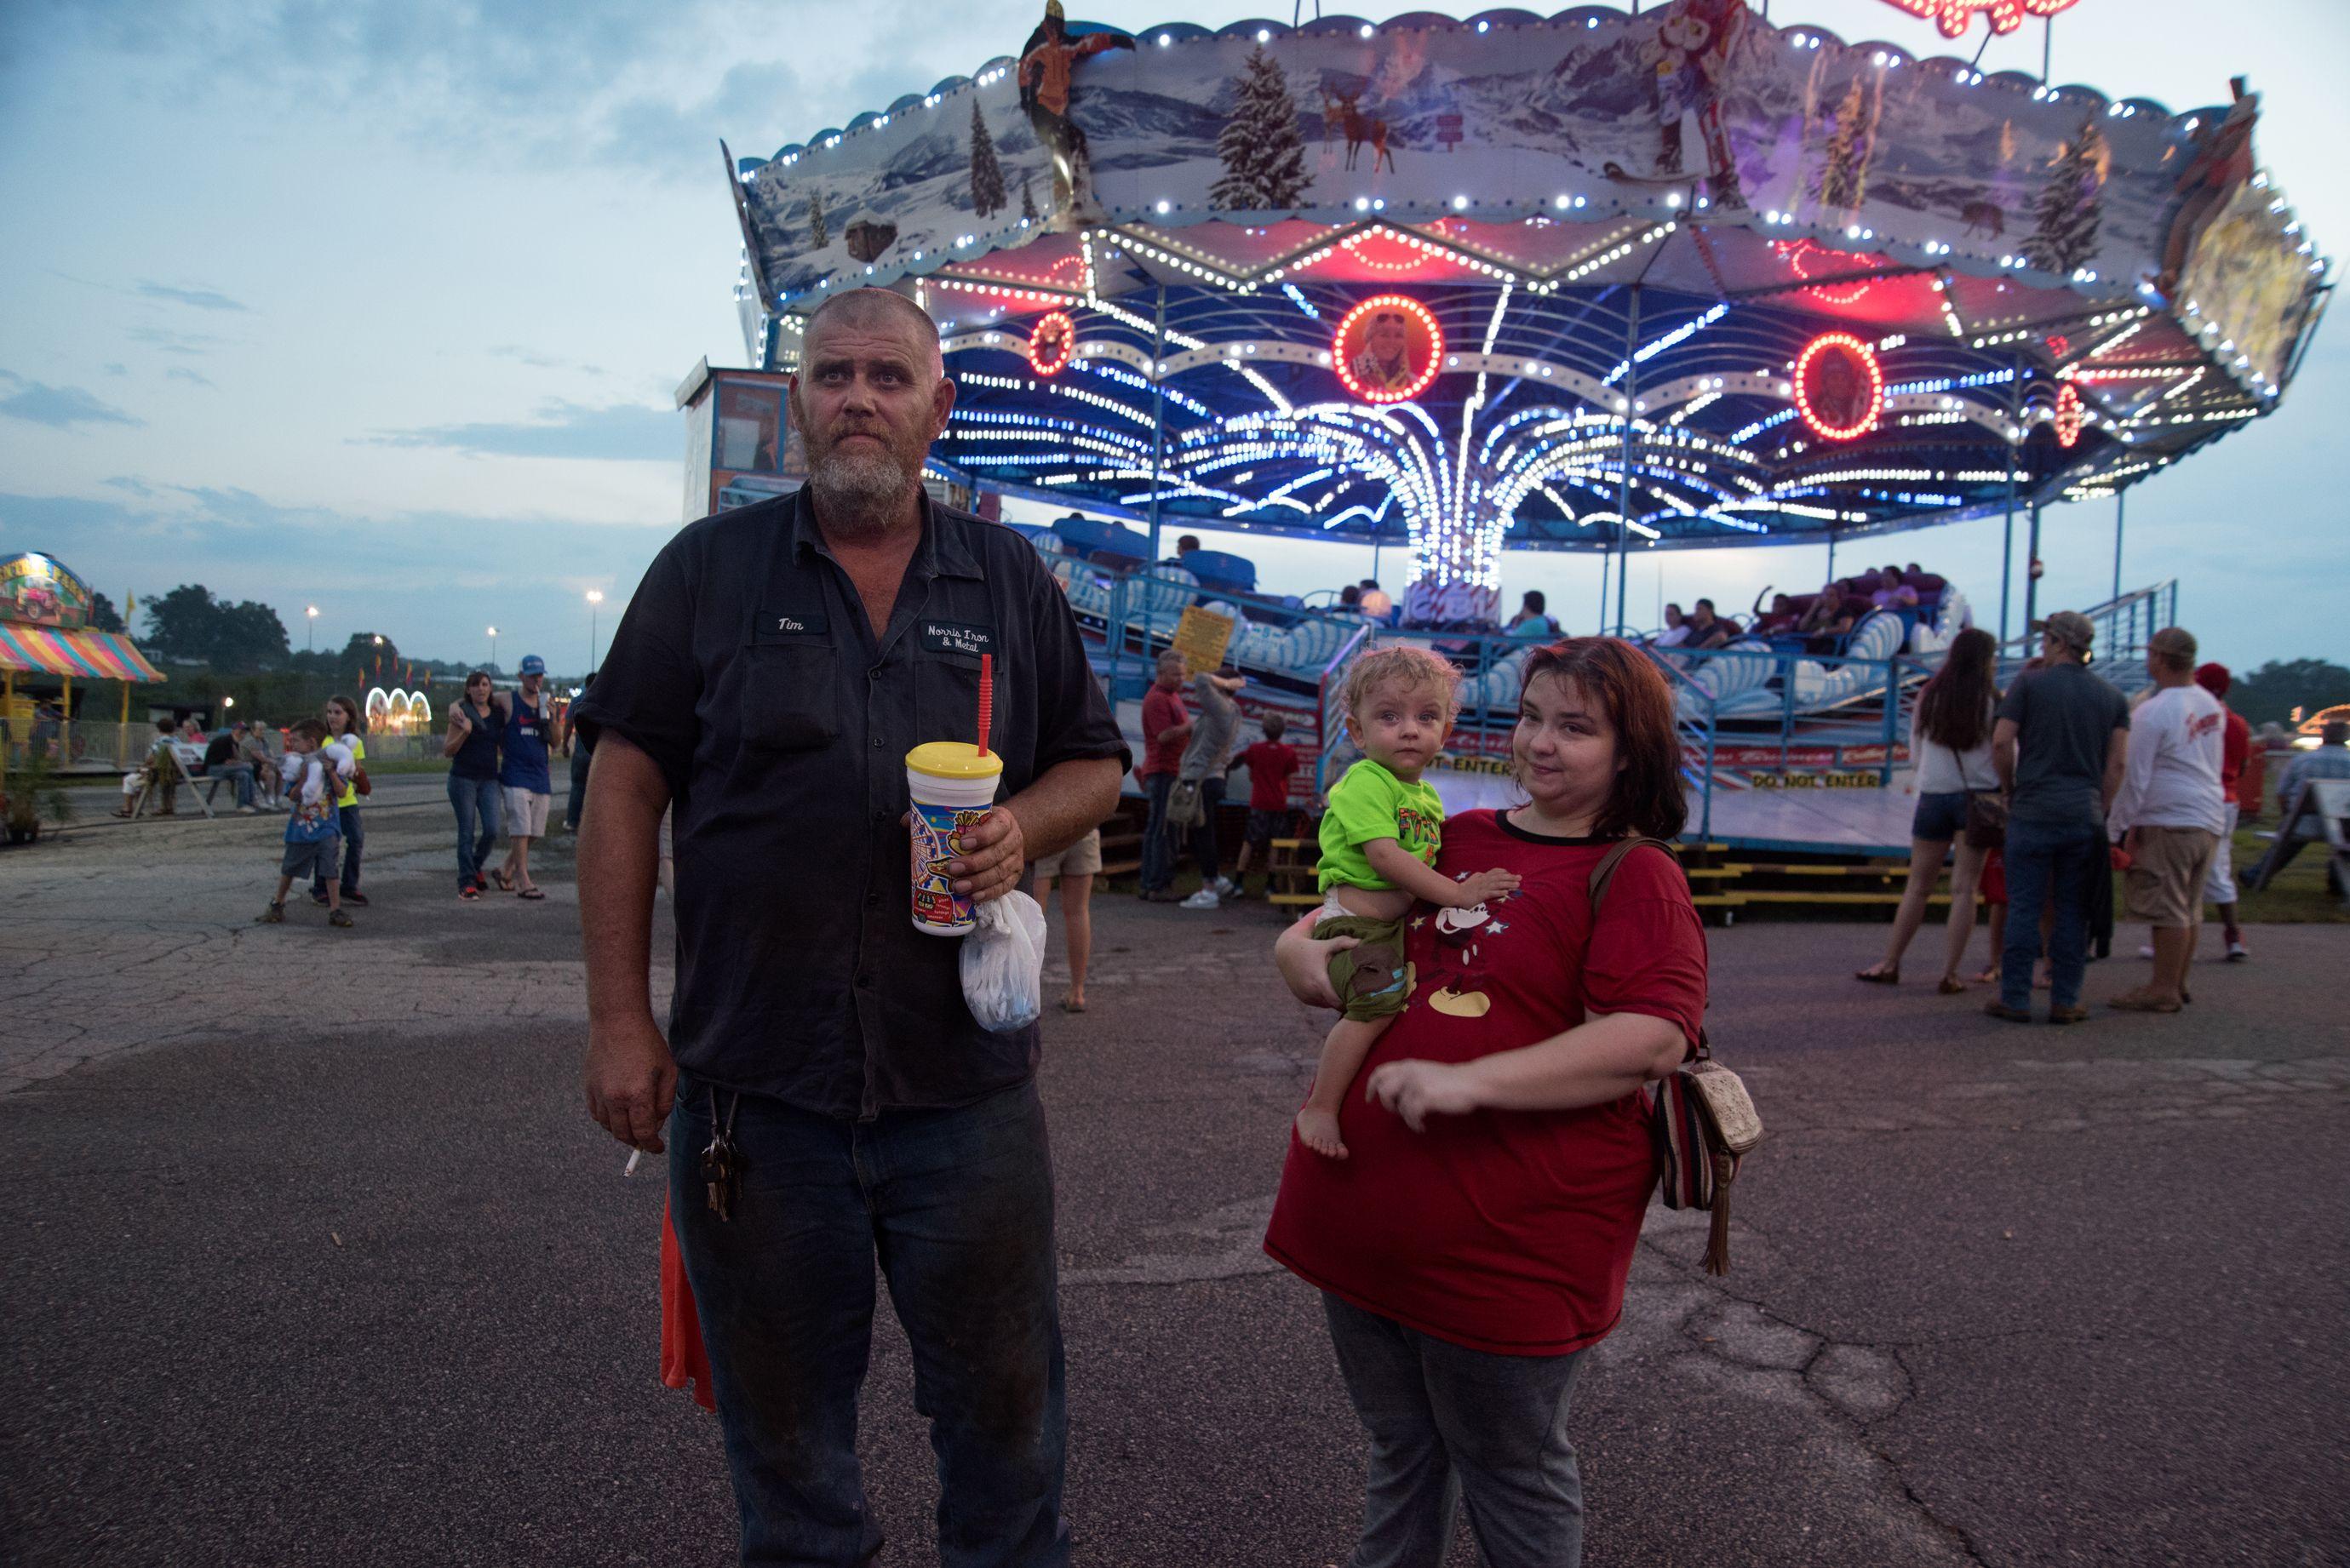 At the fair. (9 of 10)